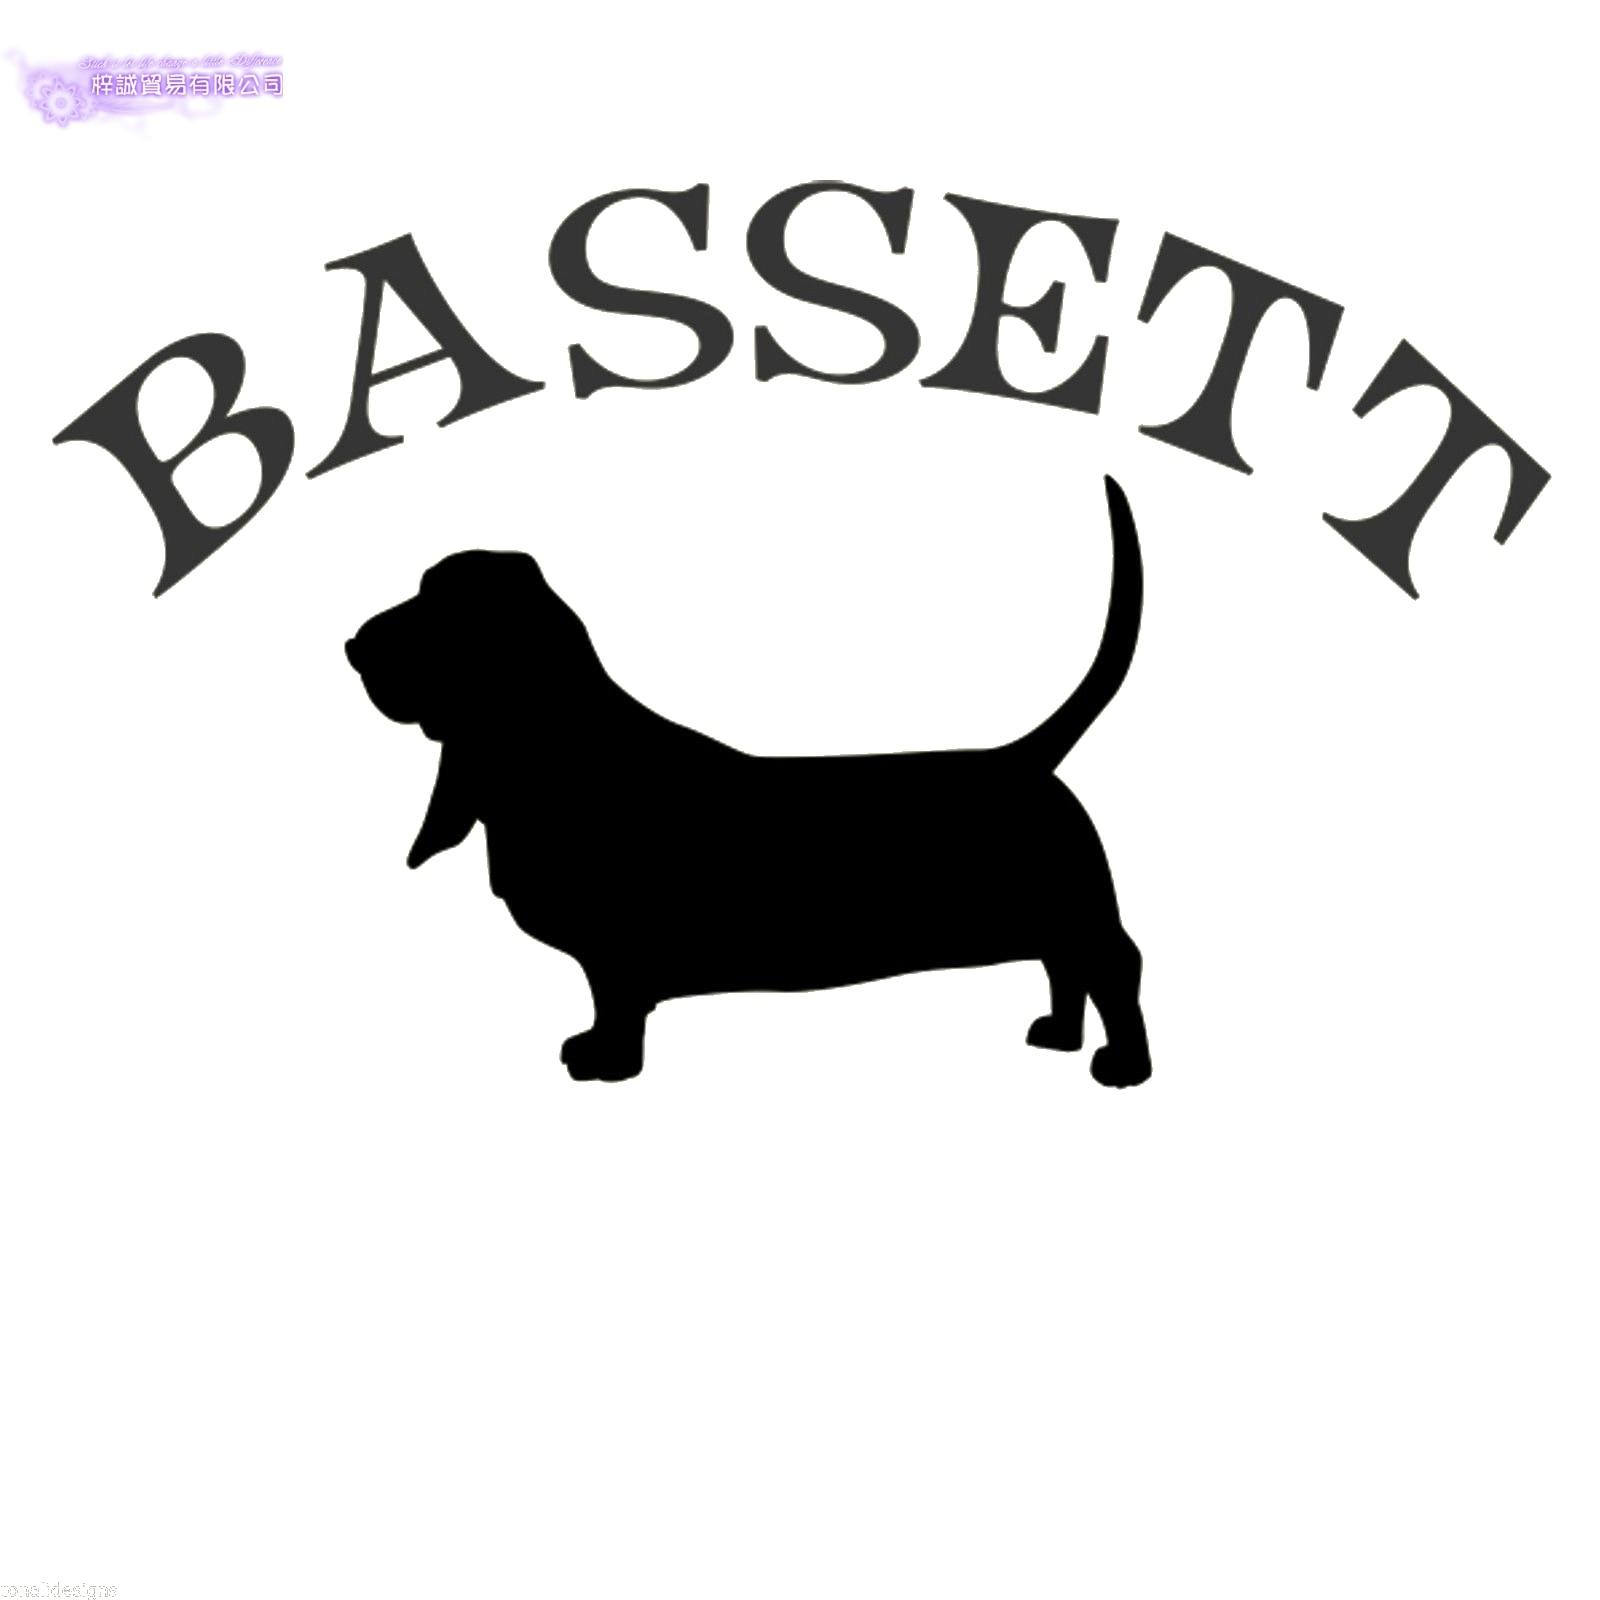 Pet Shop Sticker Dog Decal Muurstickers Posters Vinyl Wall